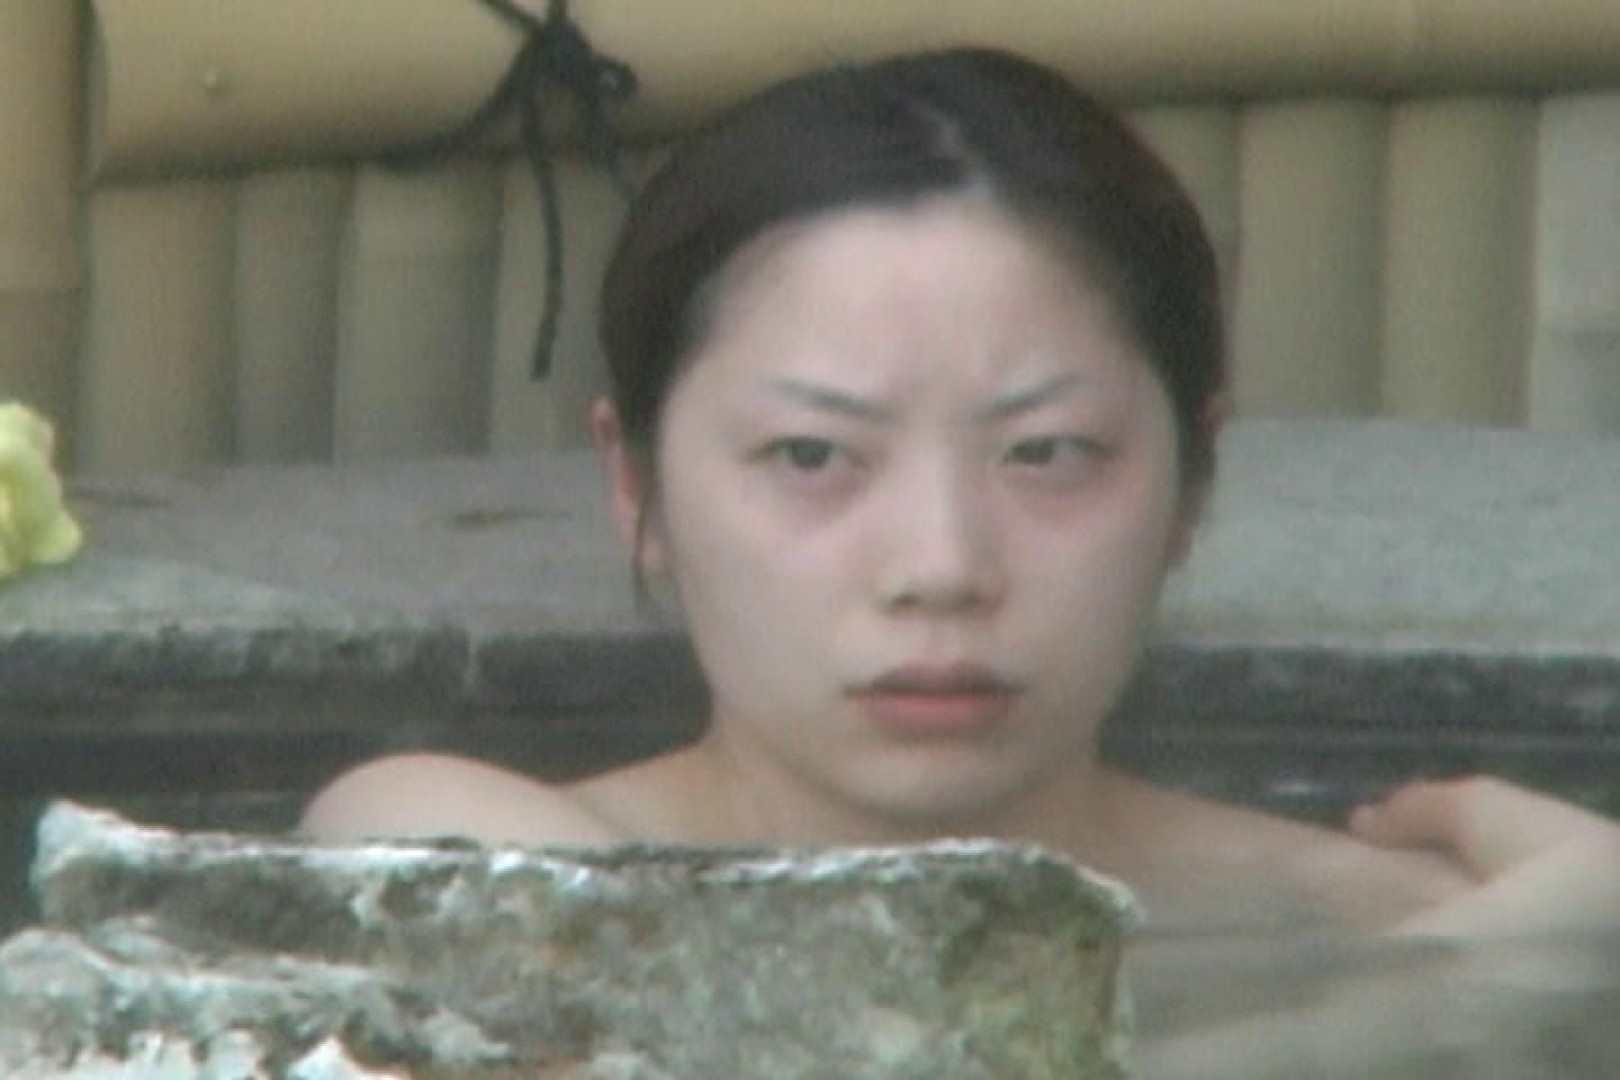 Aquaな露天風呂Vol.596 盗撮シリーズ | 露天風呂編  113PIX 7